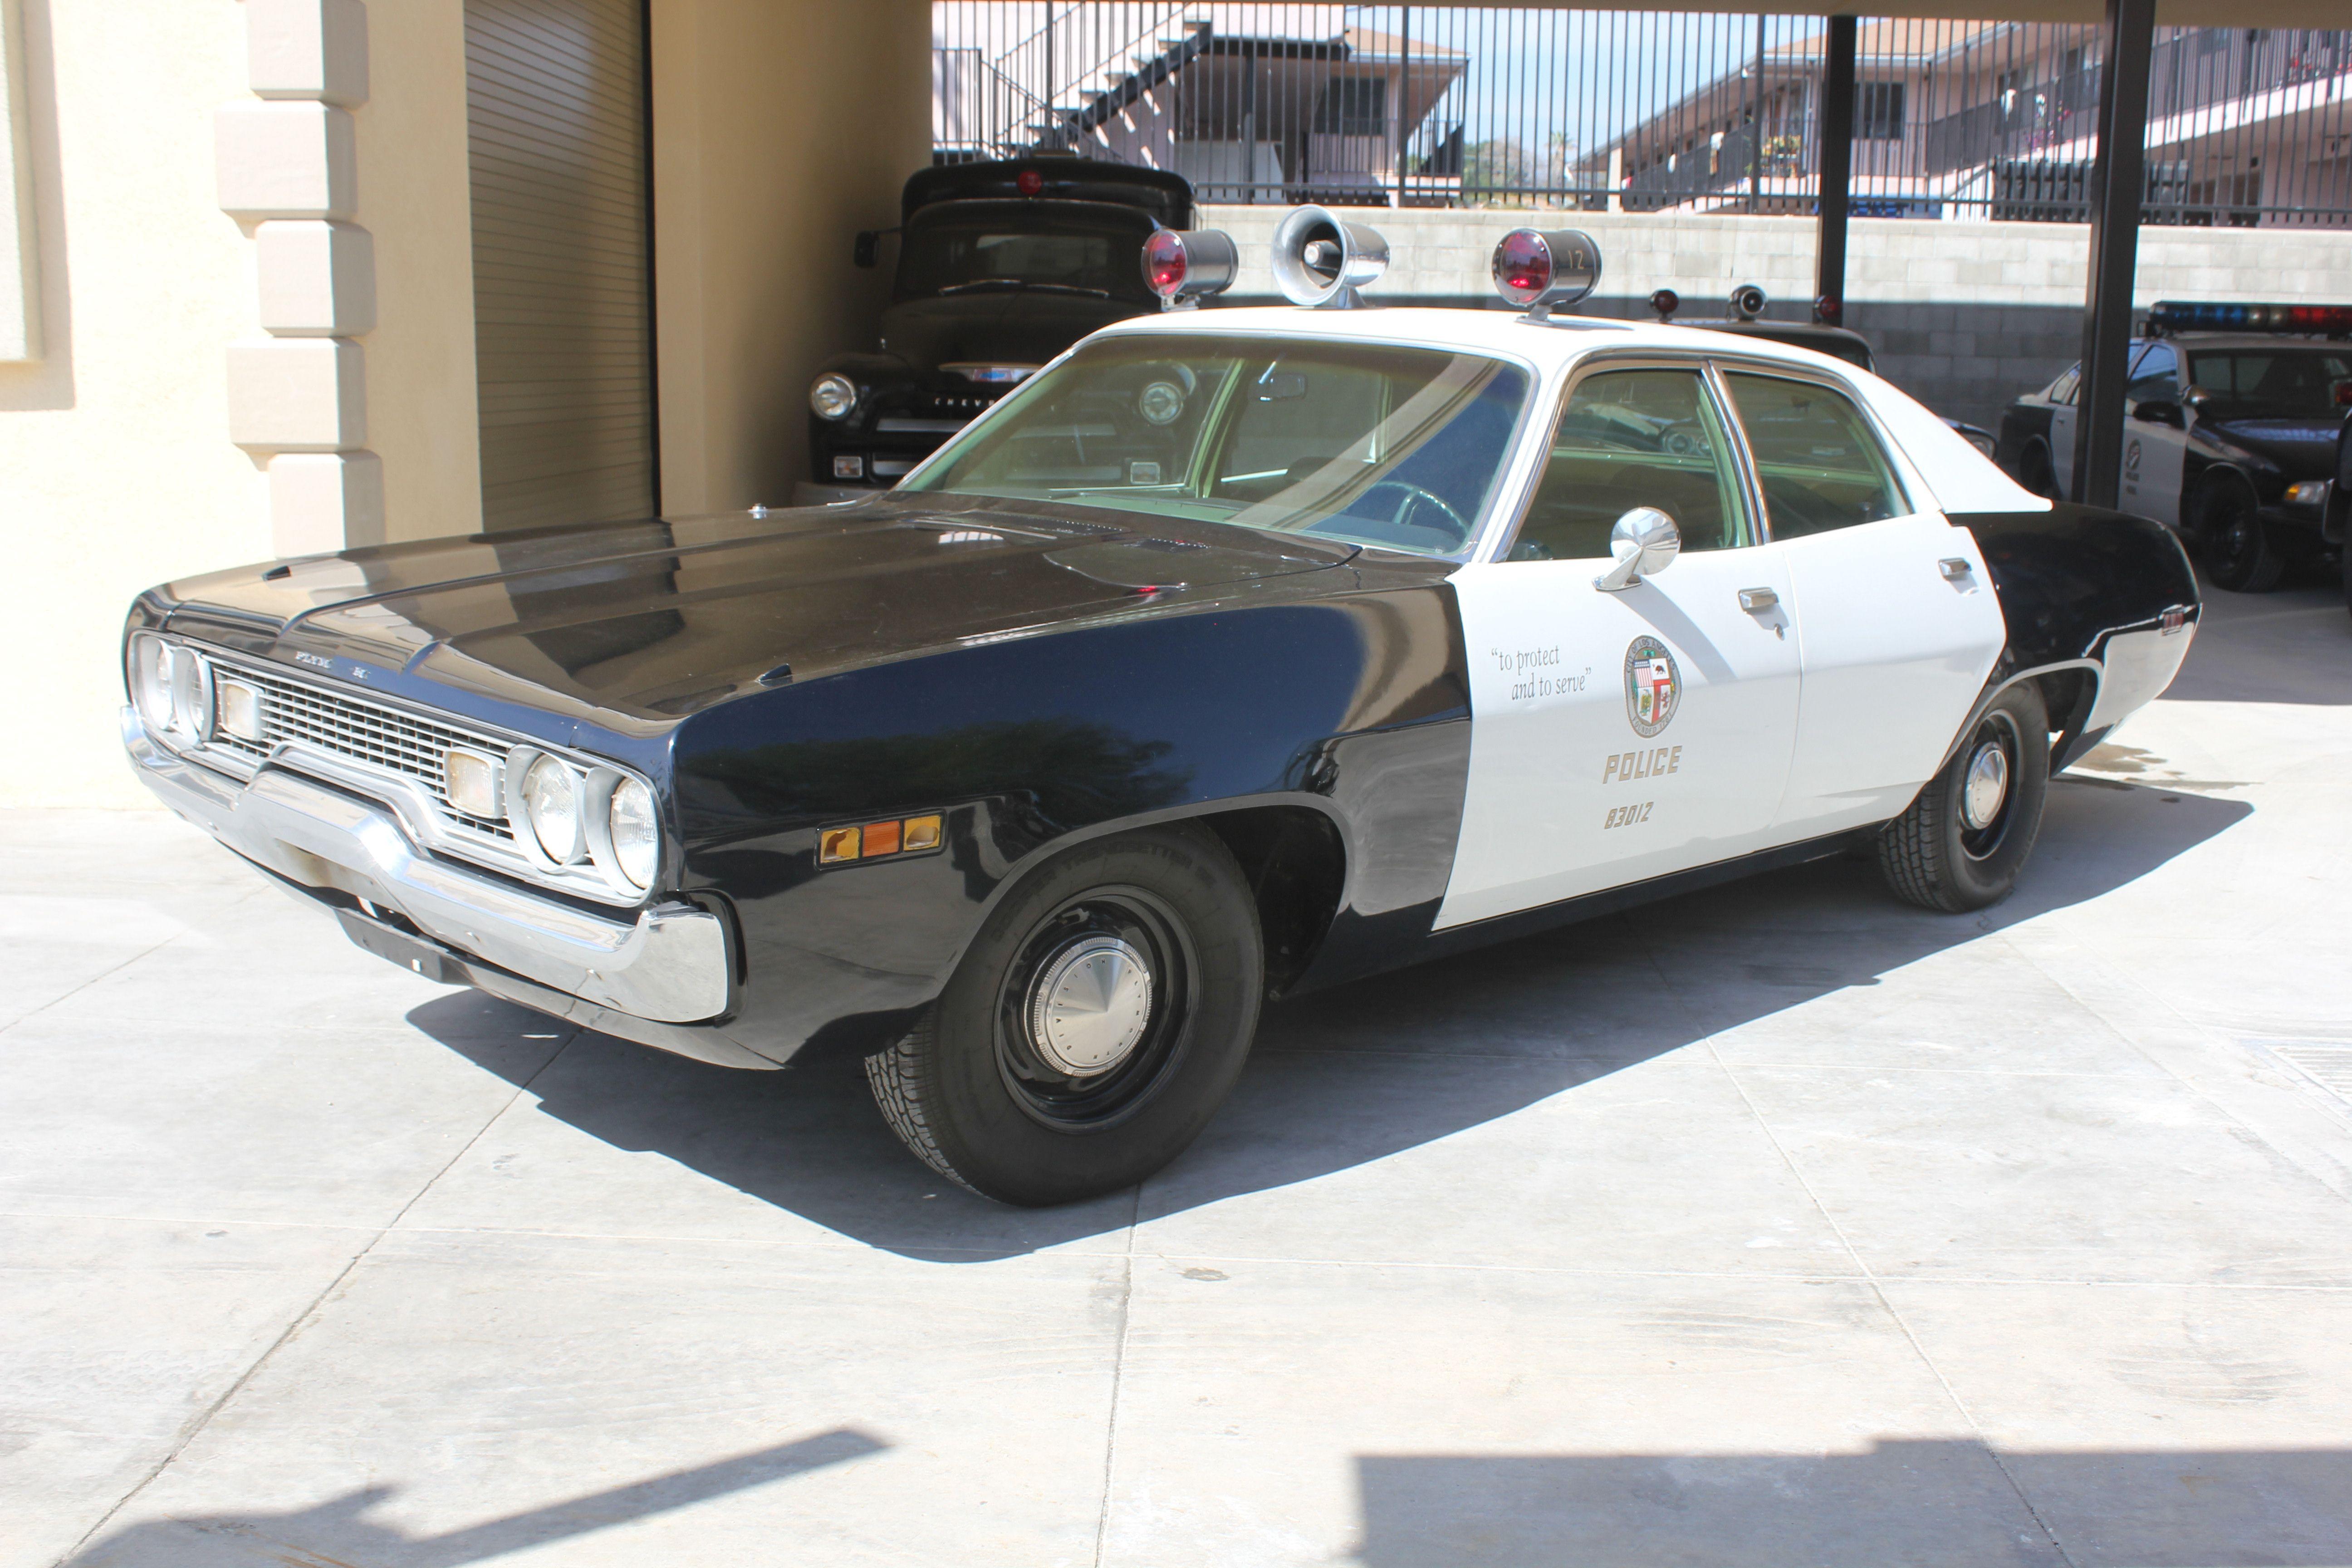 Classic Chrysler Patrol Cars